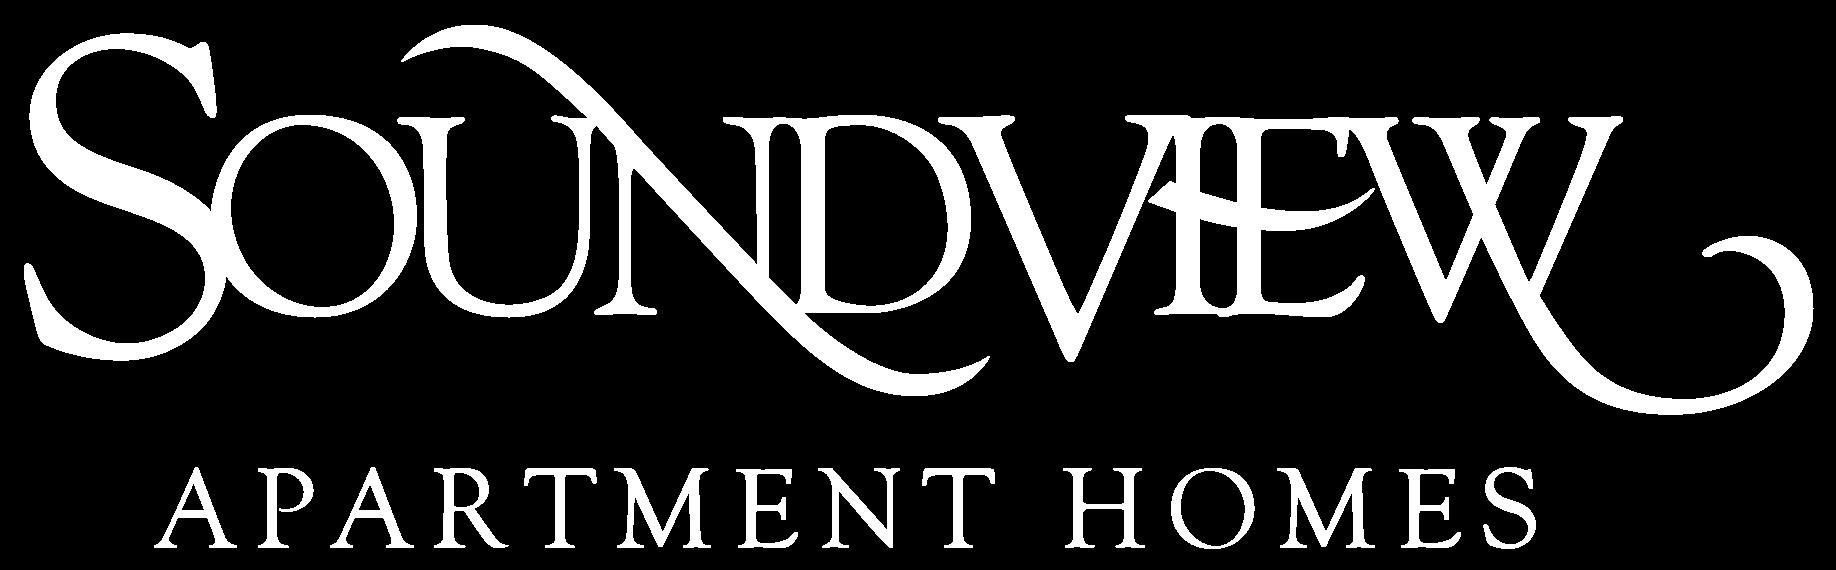 Federal Way Property Logo 20